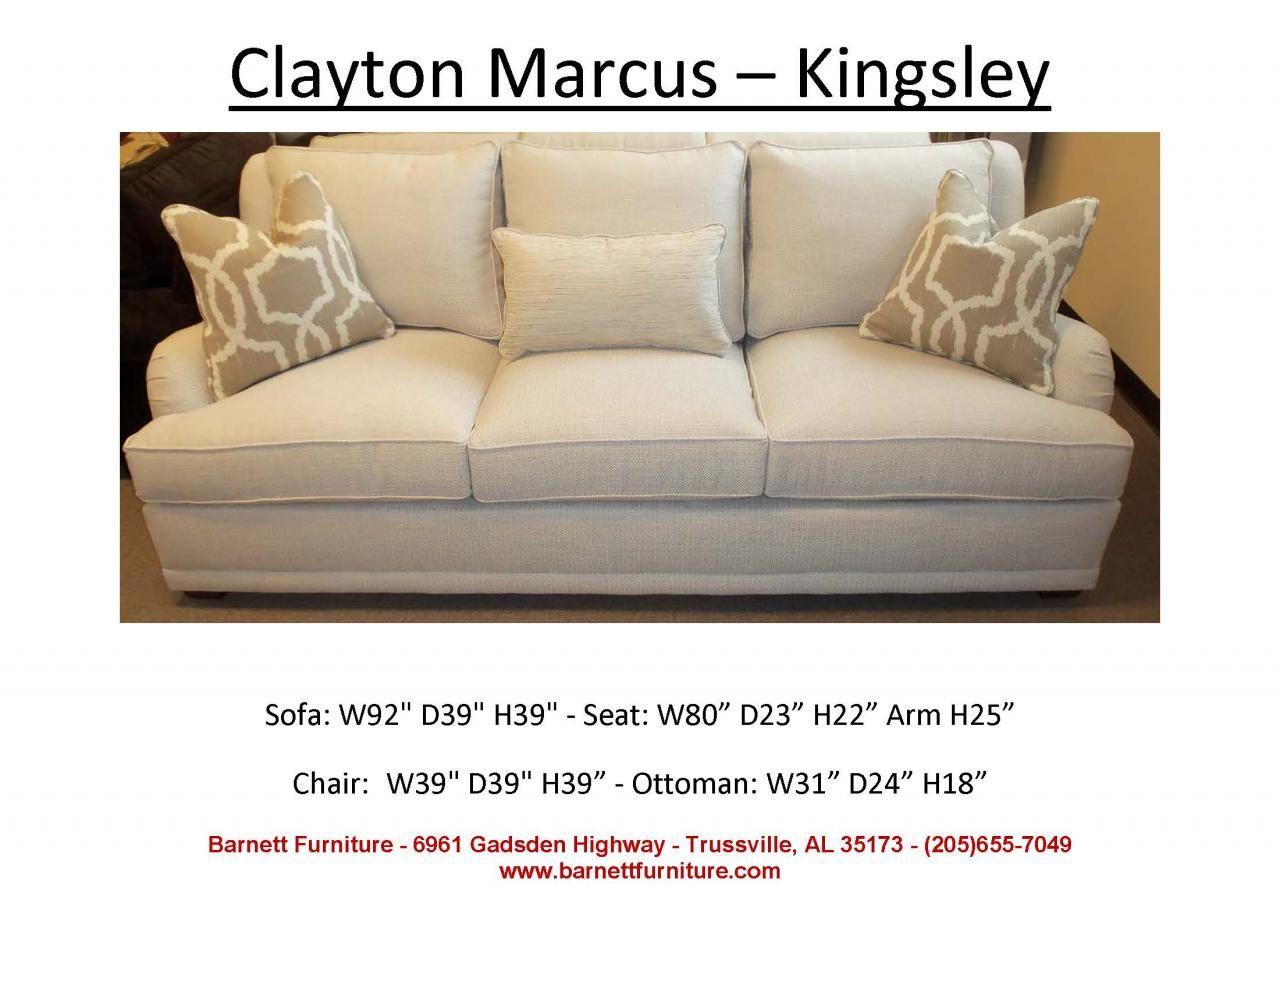 Clayton Marcus Kingsley Sofa You Choose The Fabric